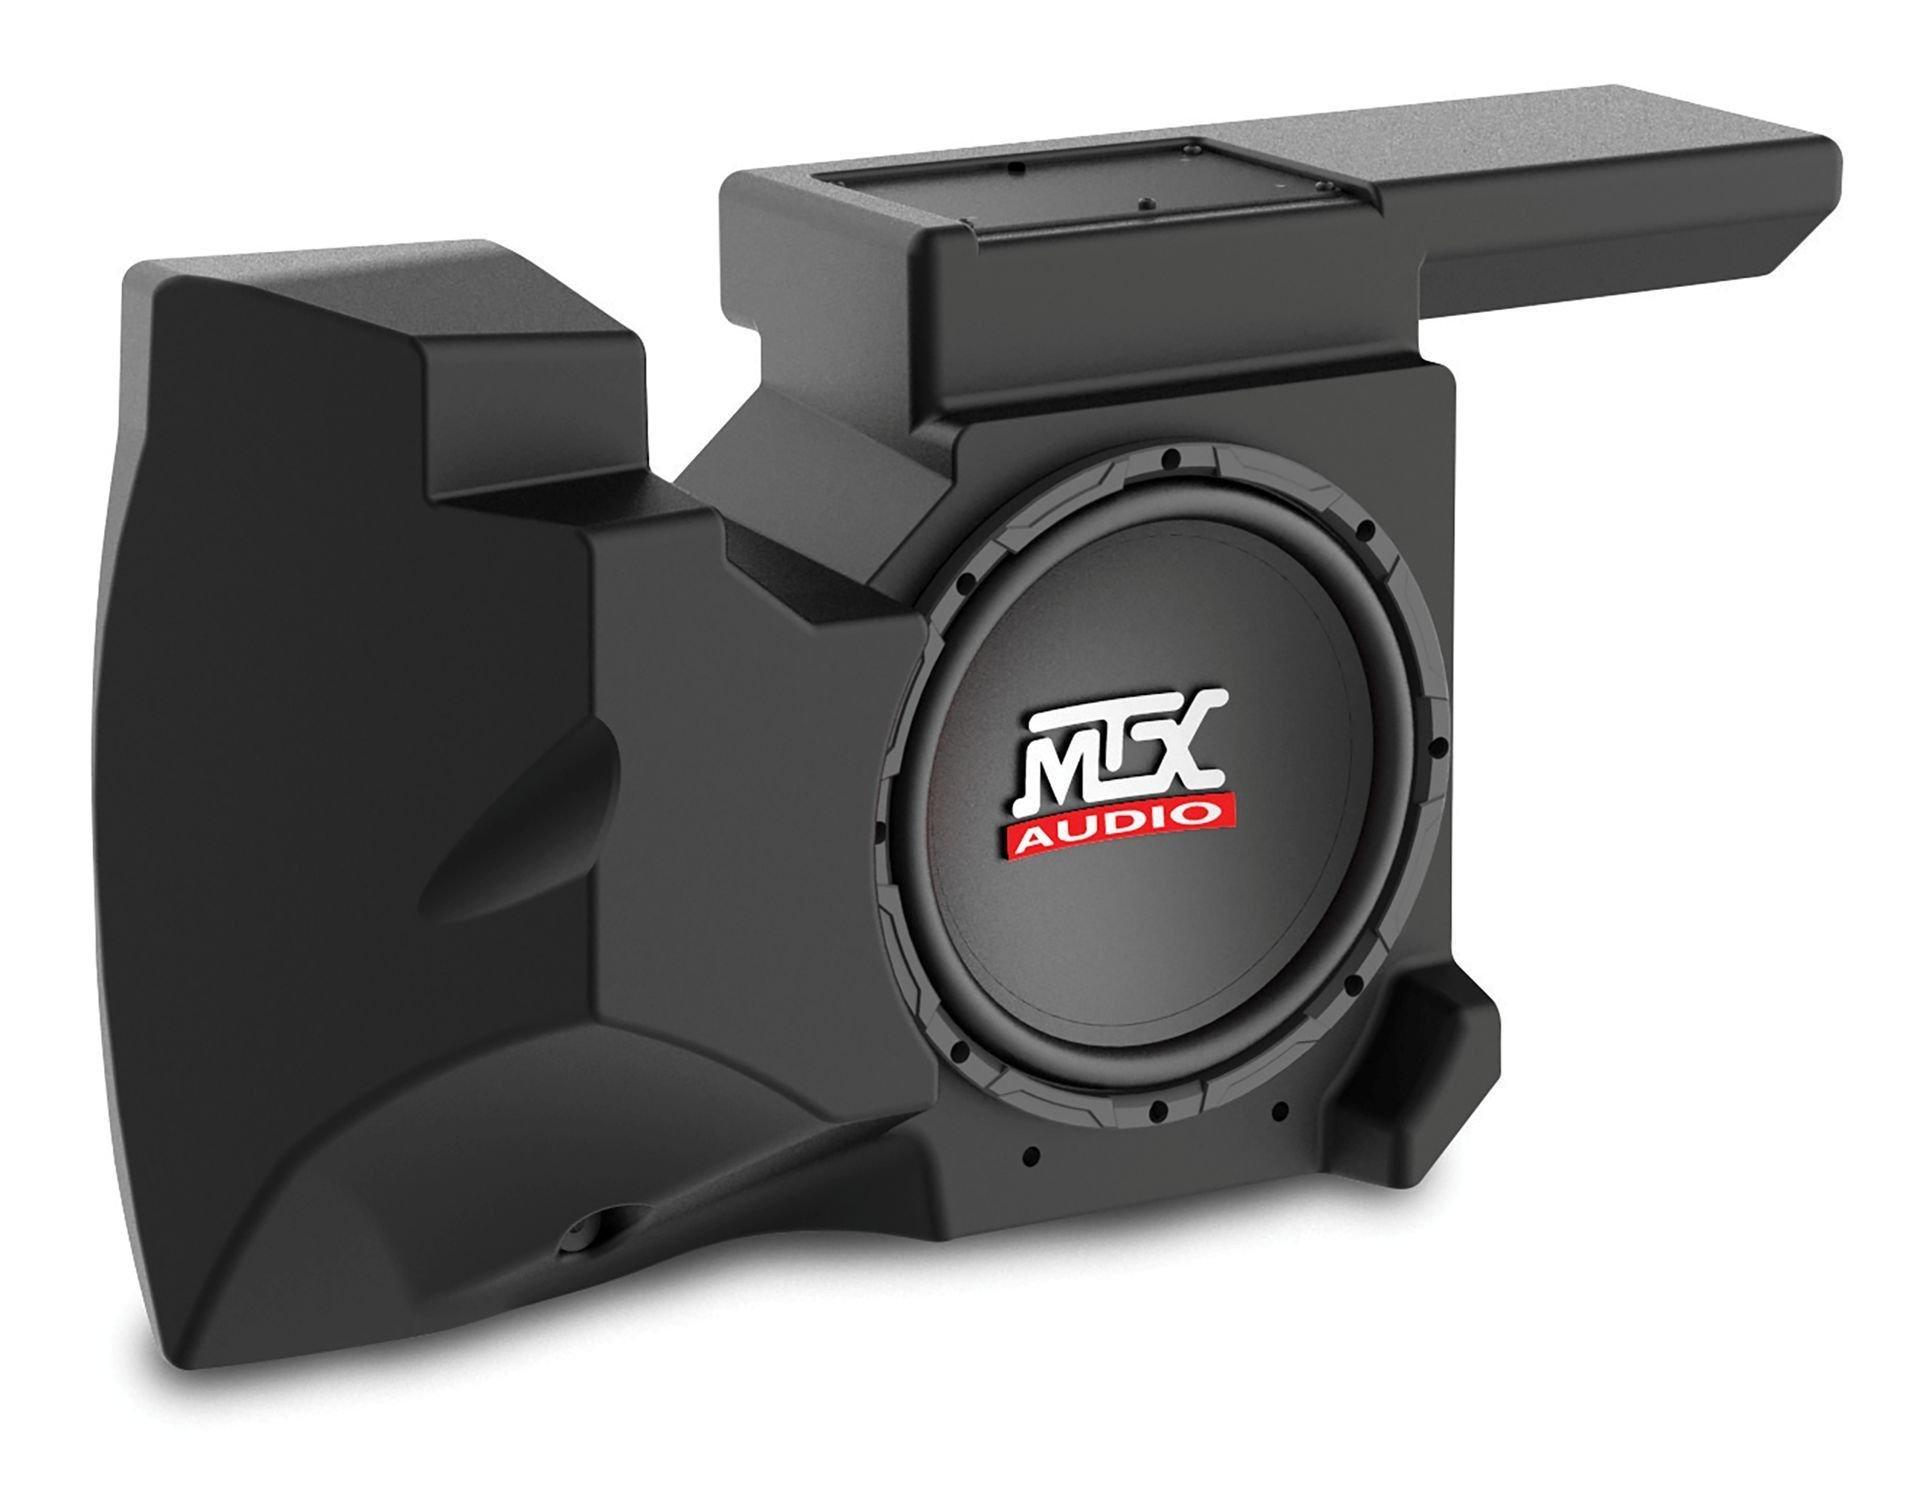 MTX Audio 2018 Polaris RZR 4 900 EPS Two Speaker, Dual Amplifier, Single Subwoofer Audio System By RZRSYSTEM2